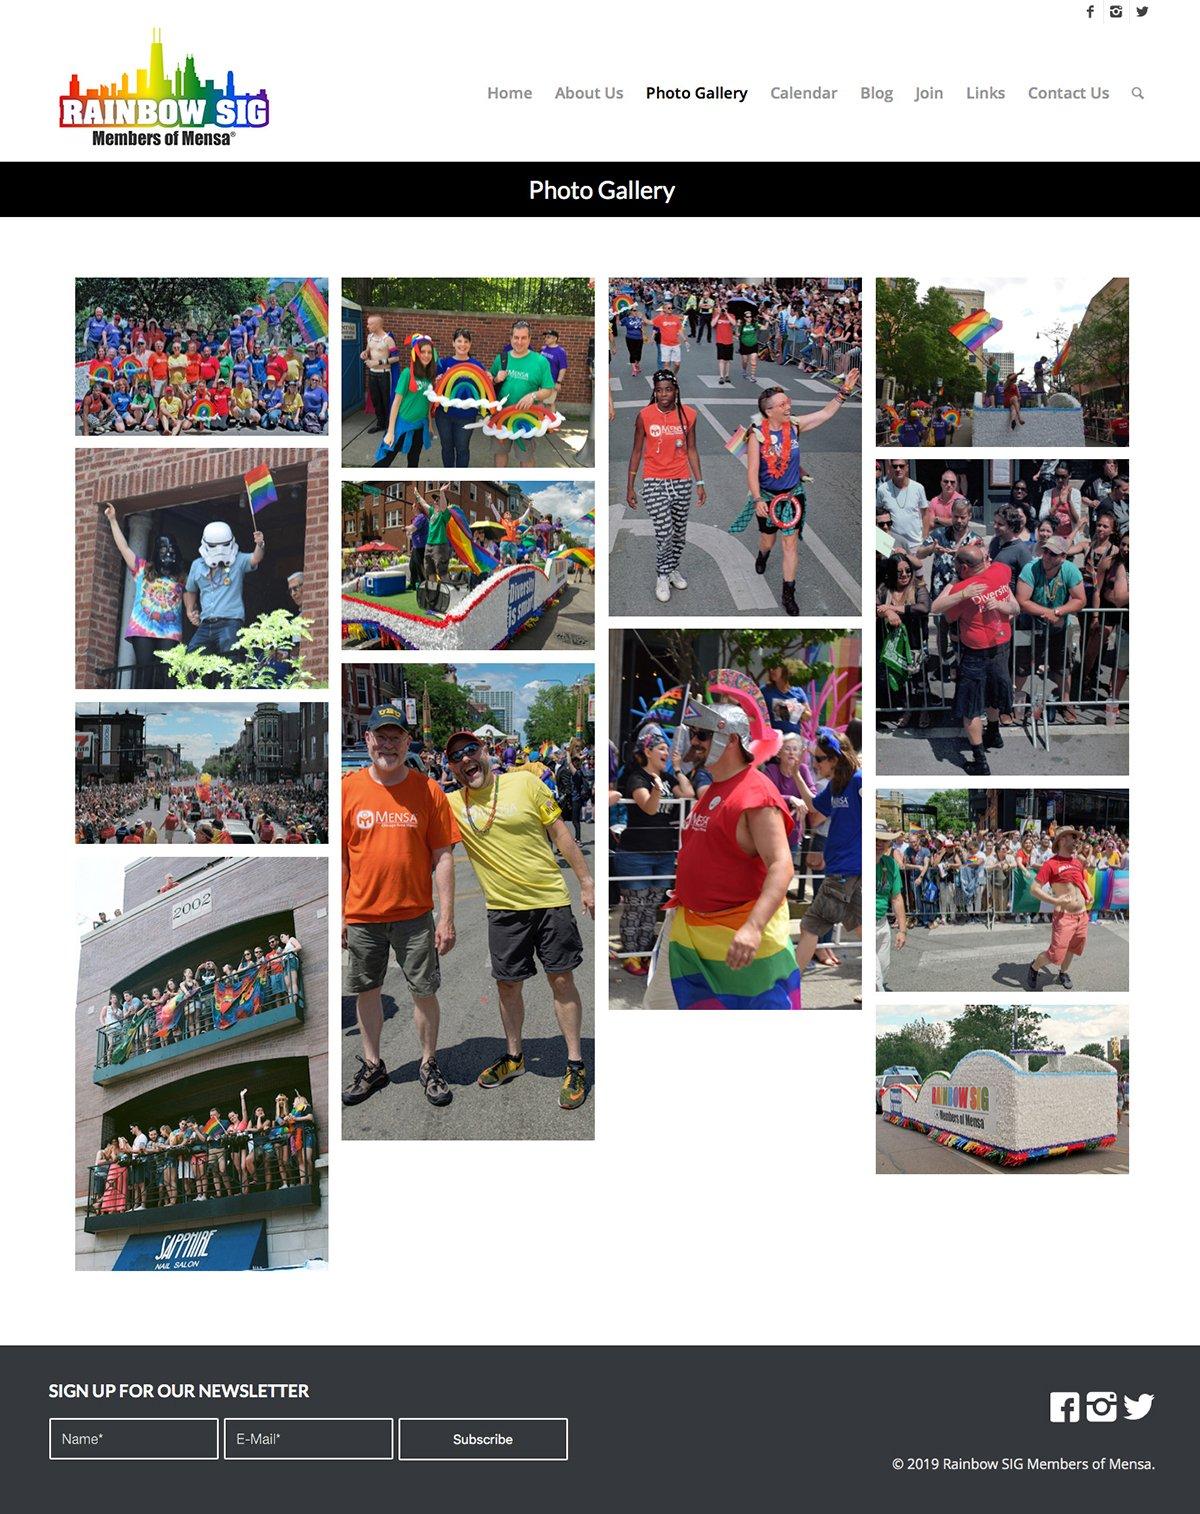 Rainbow SIG Photo Gallery